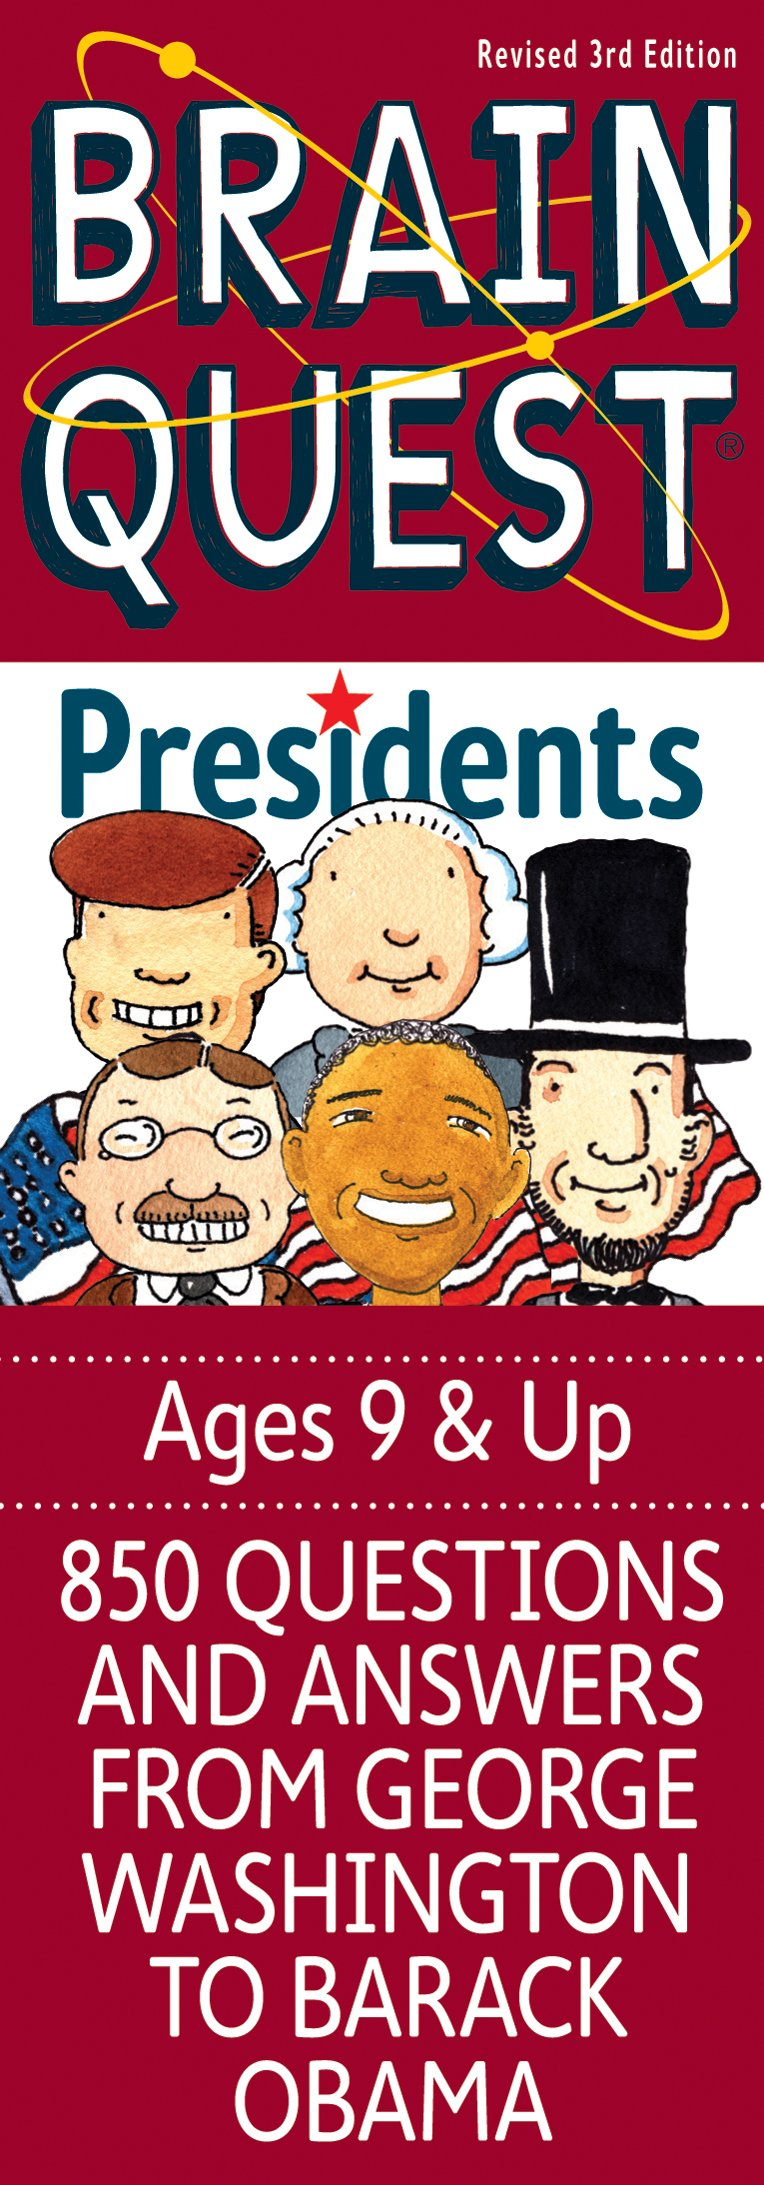 Brain Quest Presidents: Editors of Brain Quest: 9780761172383 ...